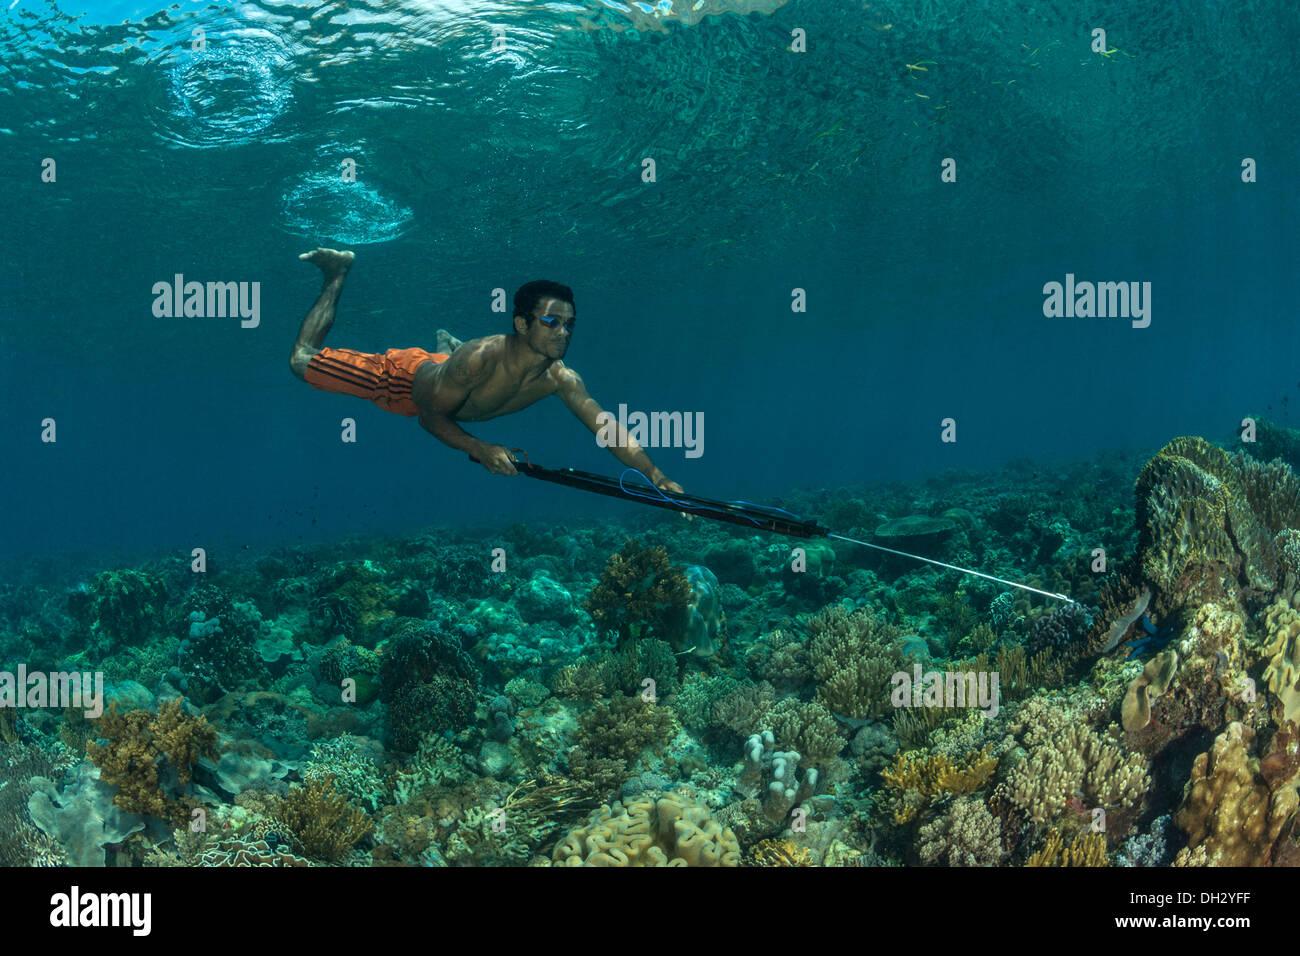 Fisherman hunting with Speargun, Pantar, Alor Archipelago, Lesser Sunda Islands, Indonesia - Stock Image